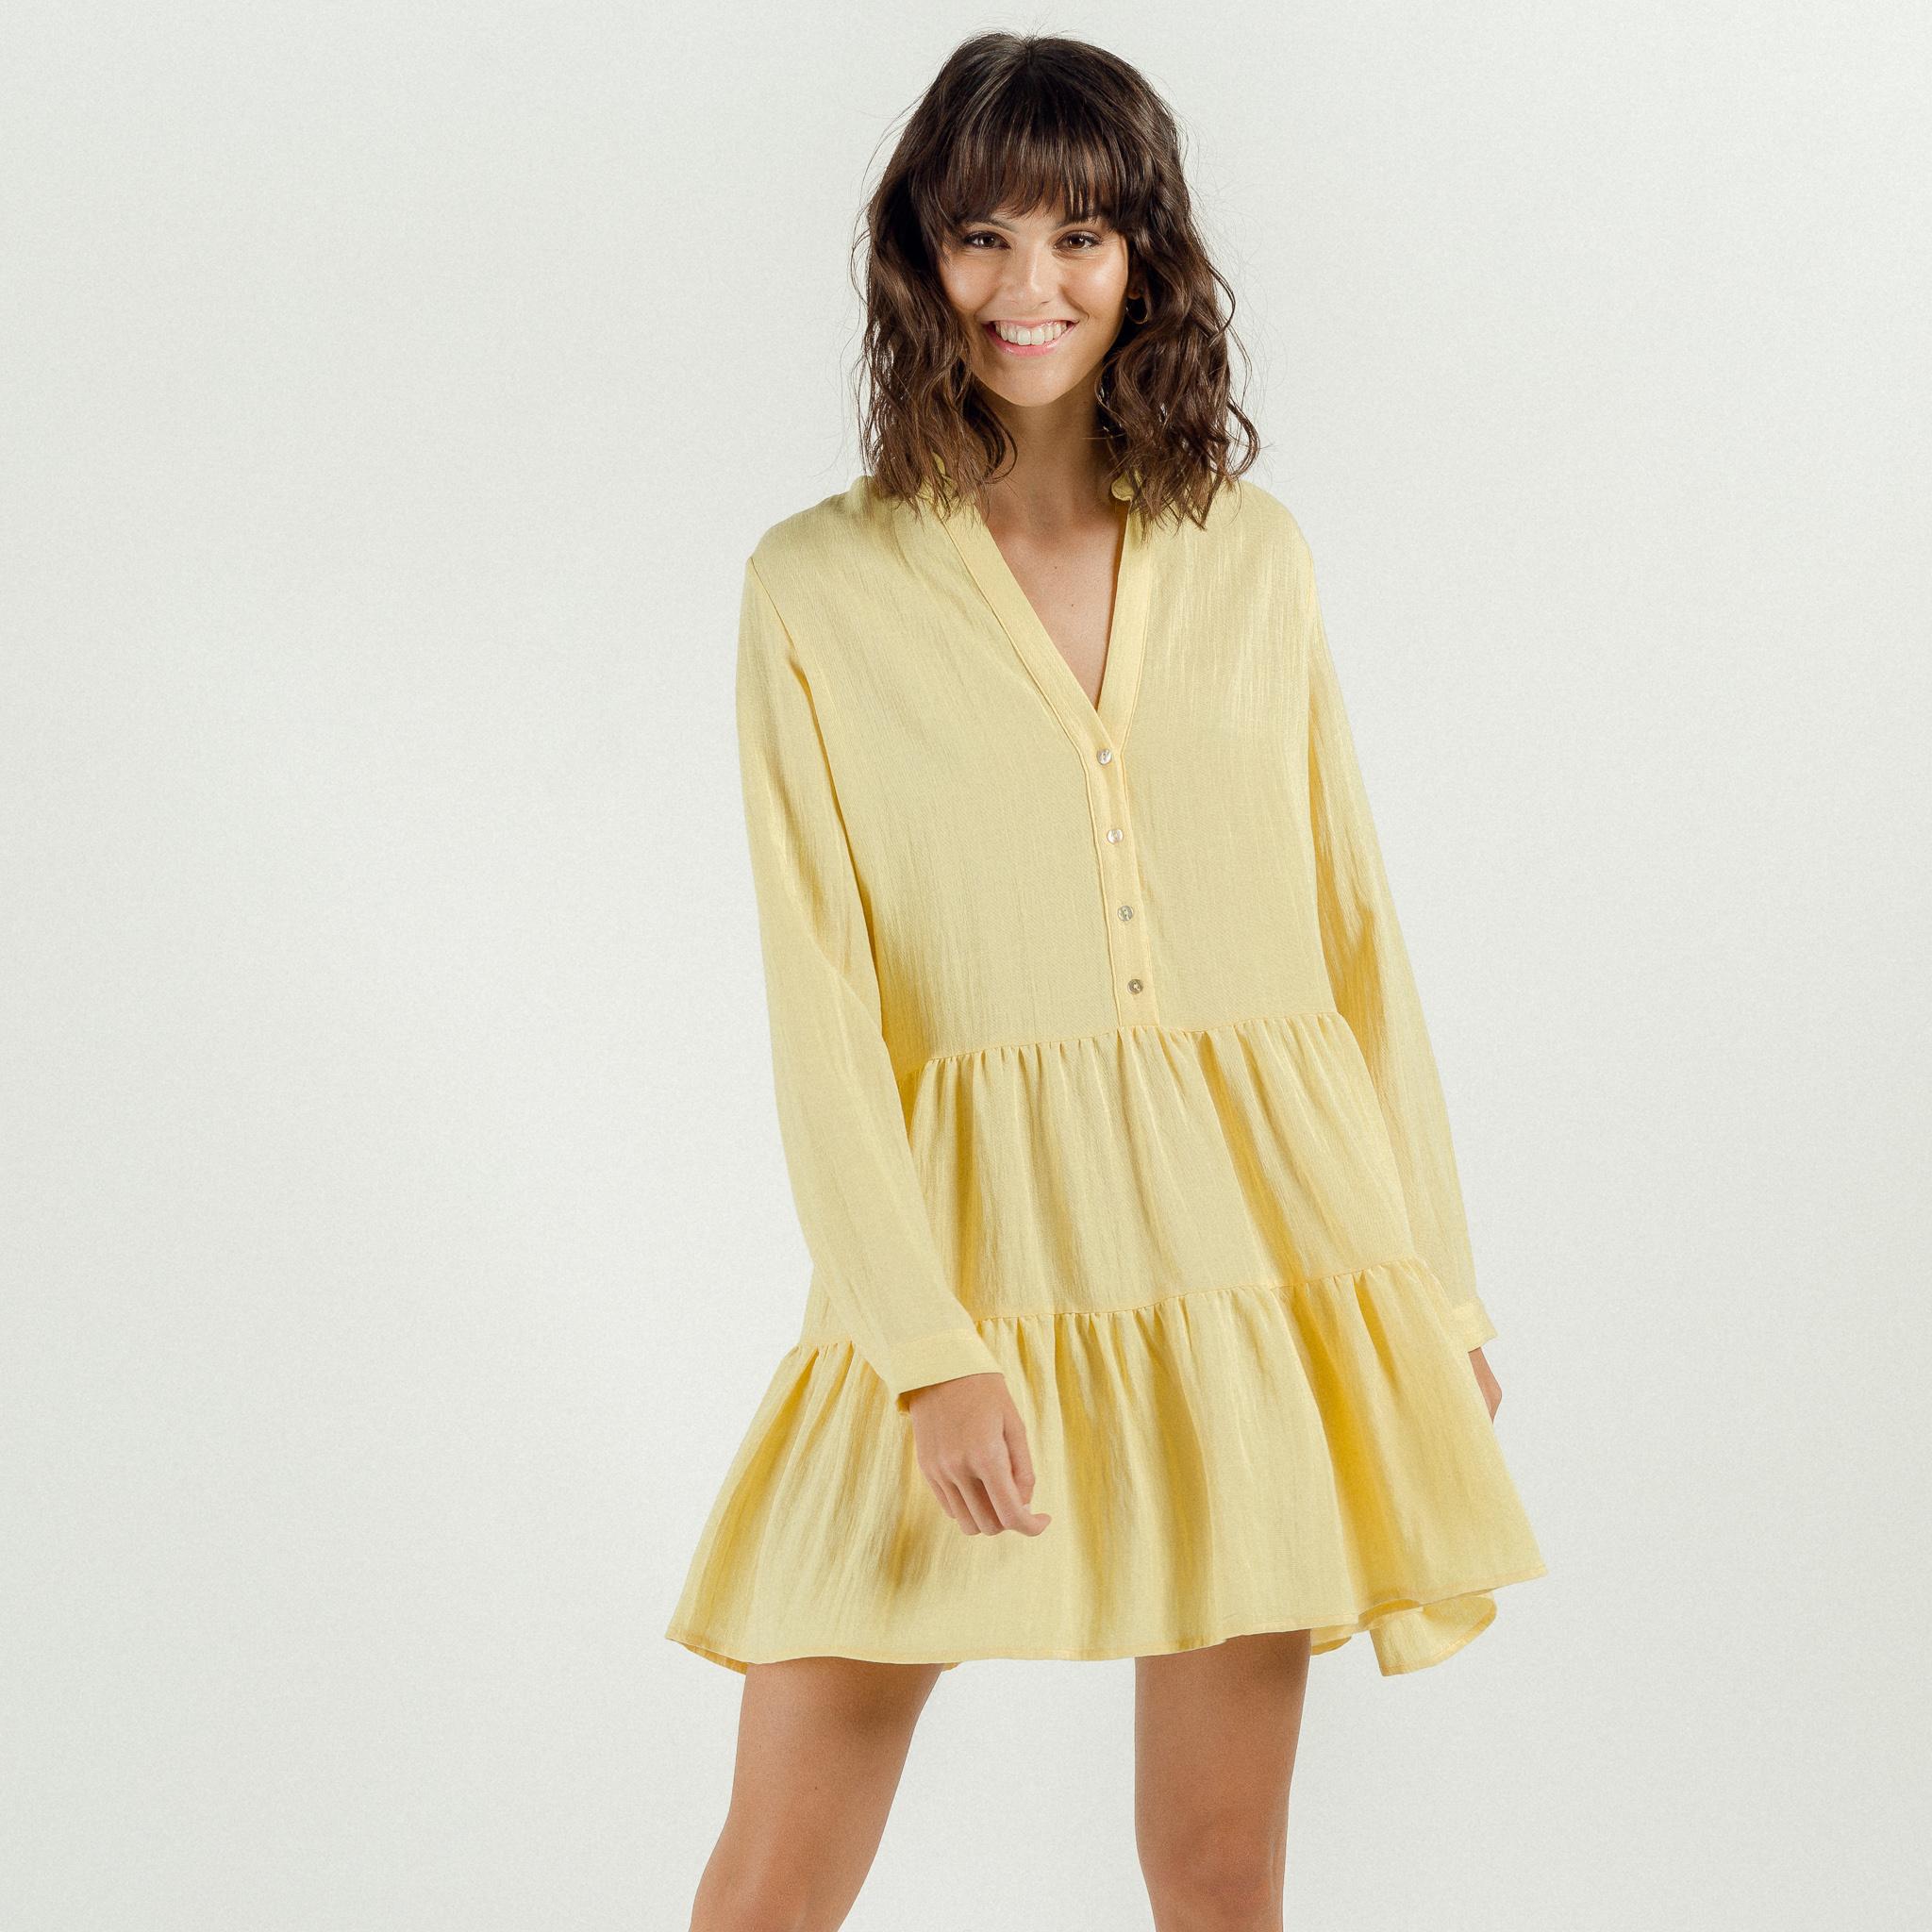 PEPITES robe yellow-5